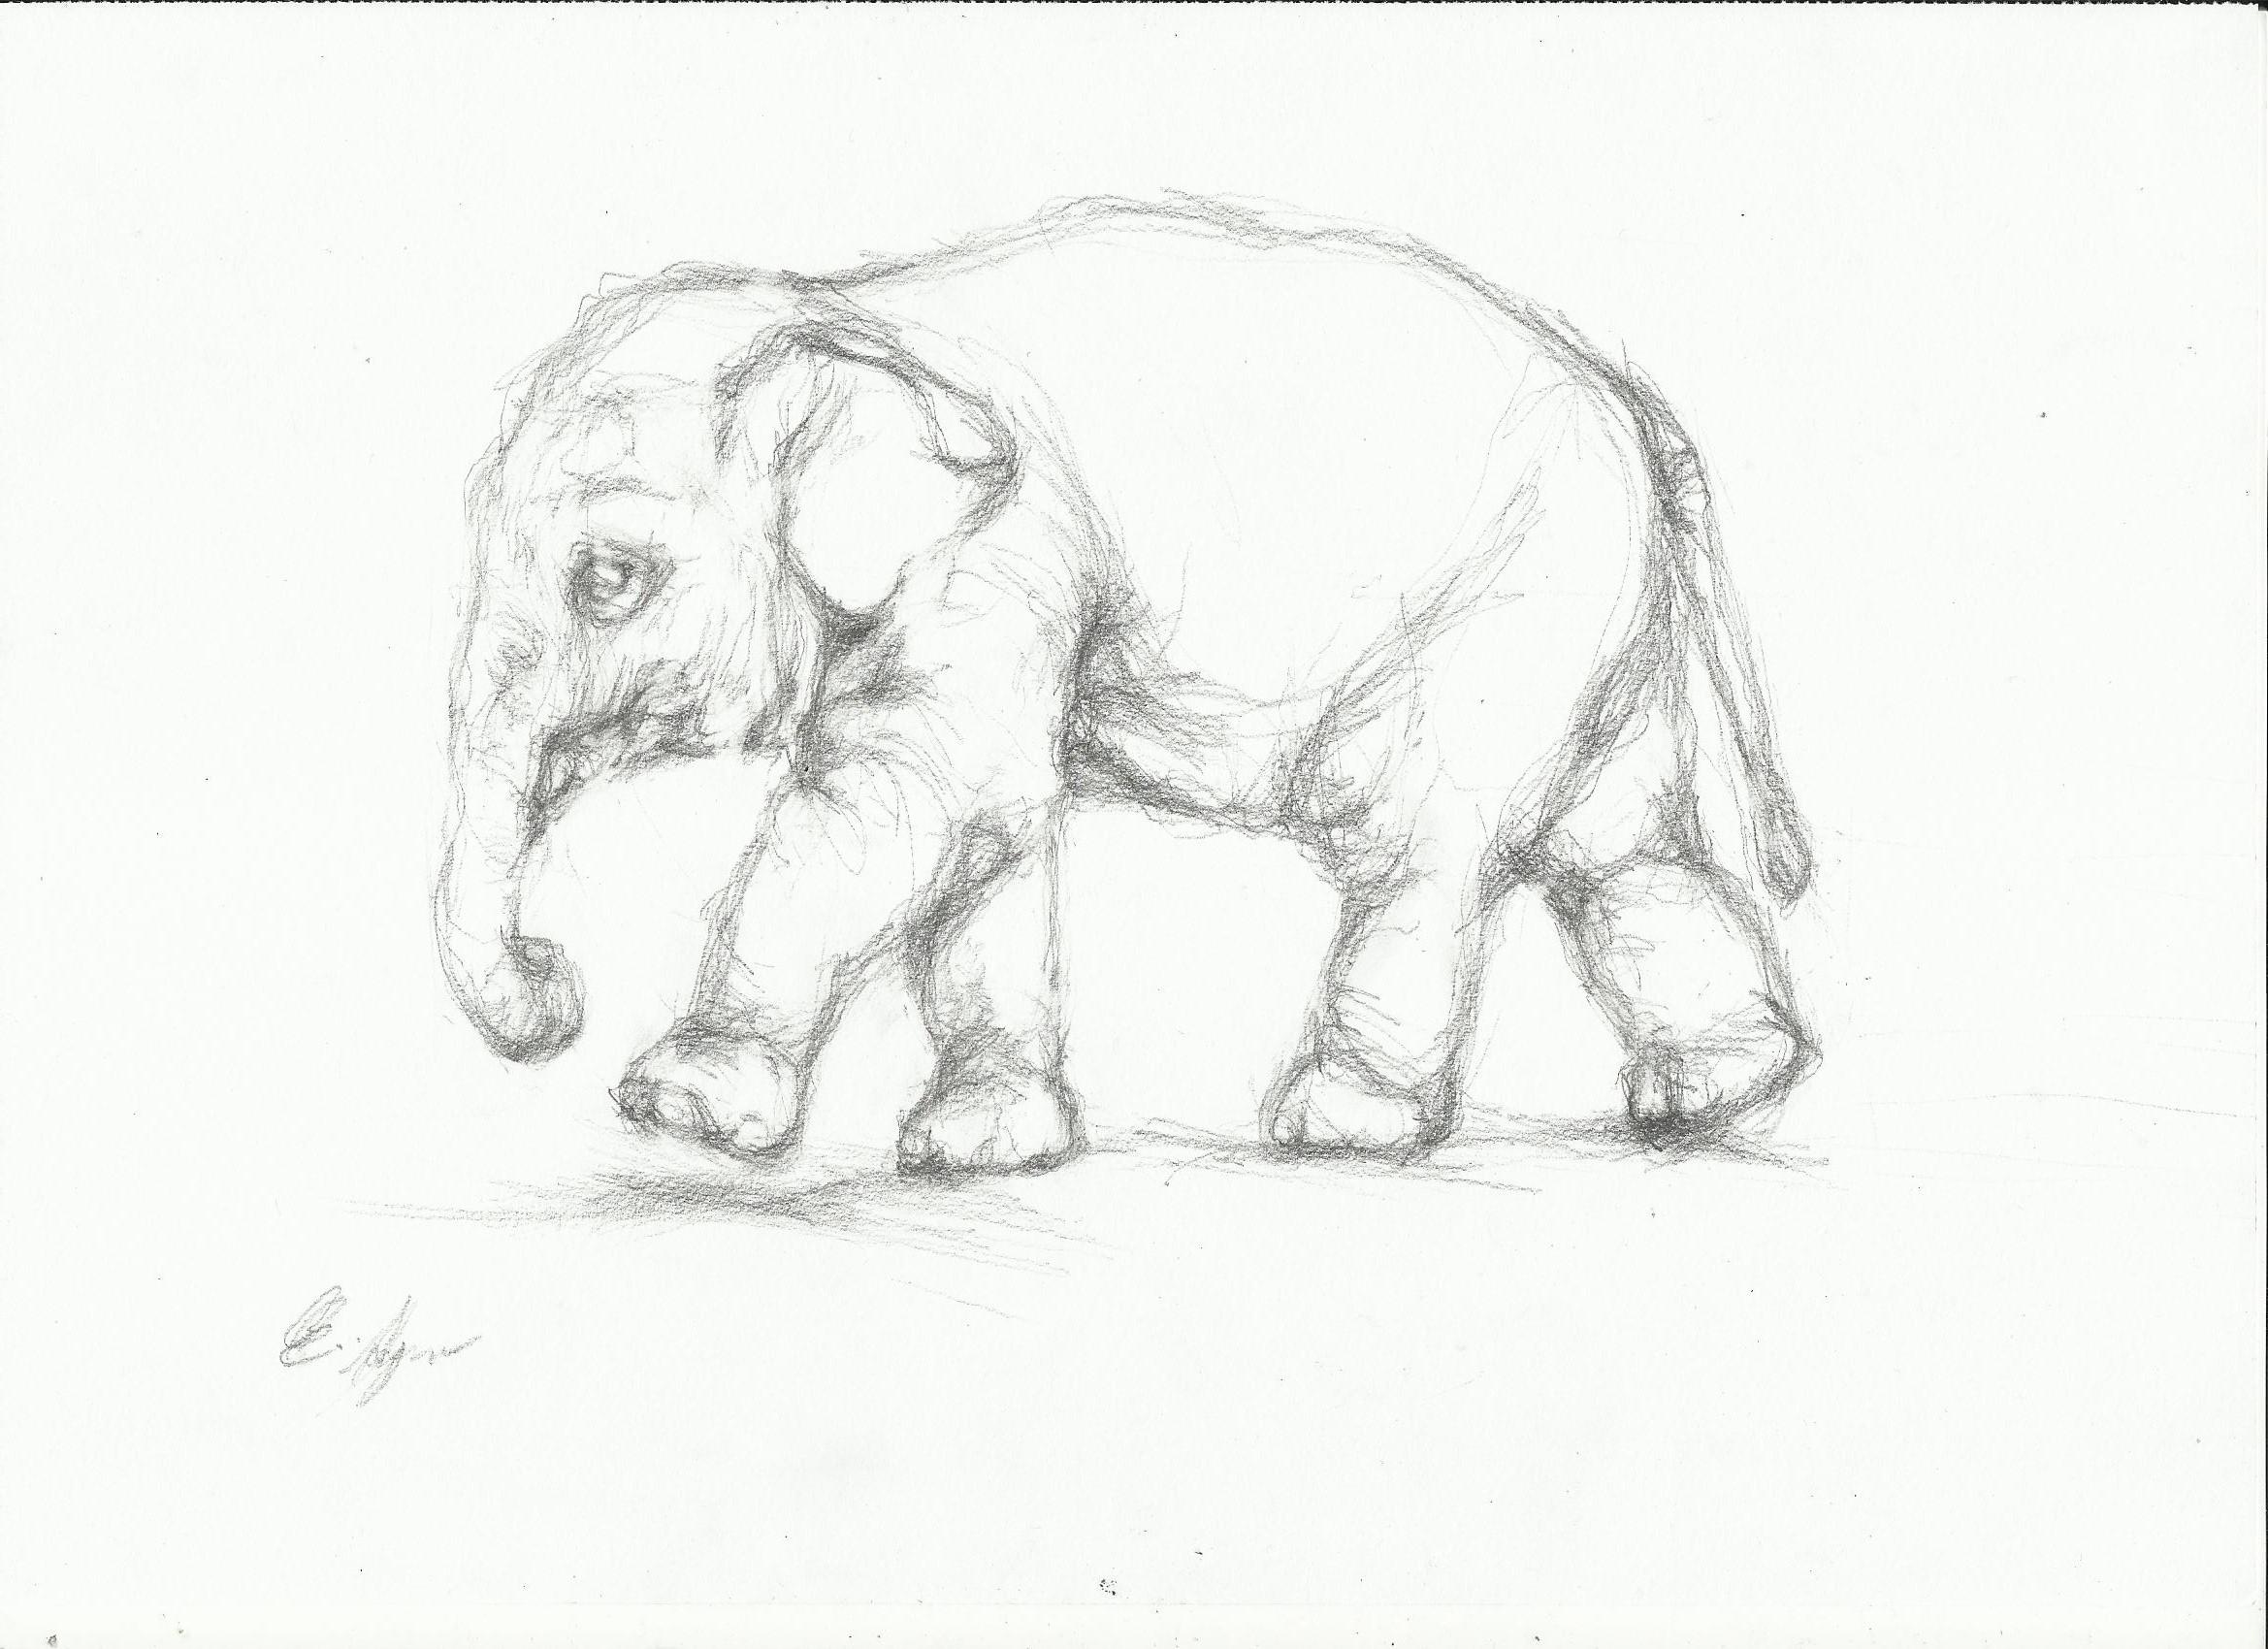 2338x1700 Elephant Pencil Sketch Elephant Sketch Tag Archives Elephant